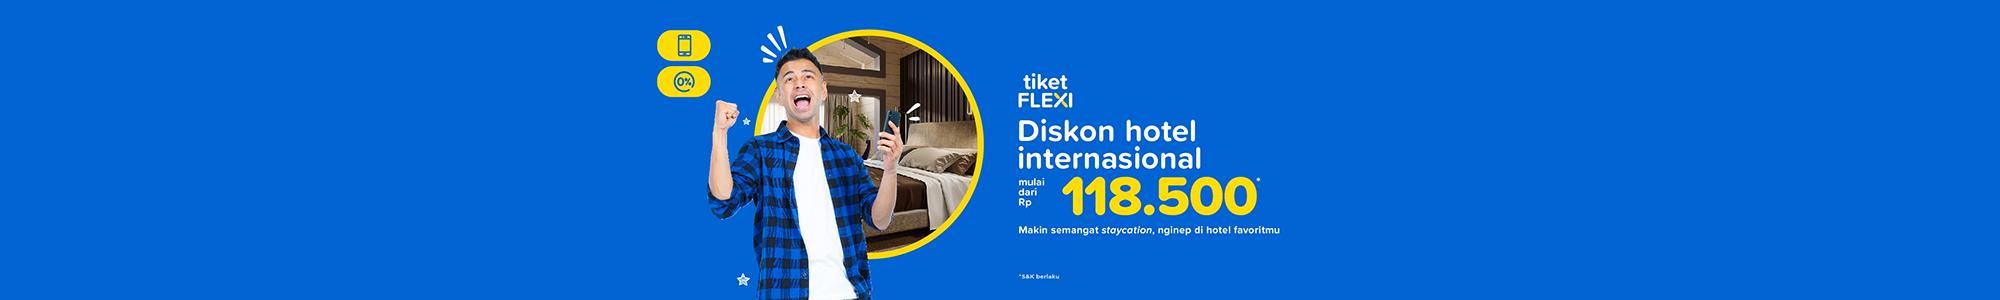 Promo Tiket Flexi Hotel Internasional - tiket.com